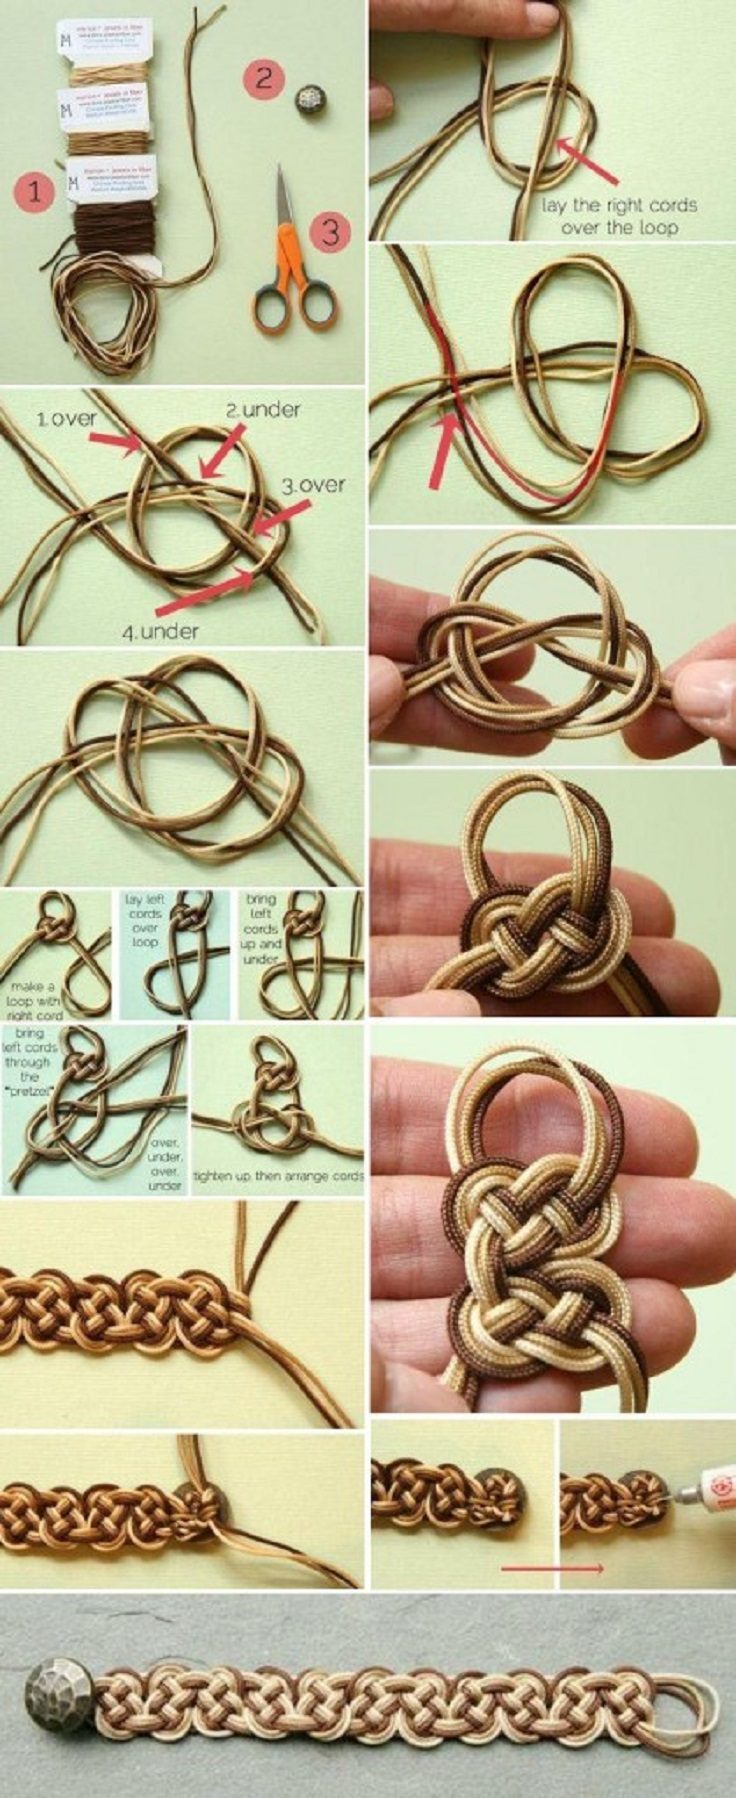 Ombre-Knotted-Bracelet